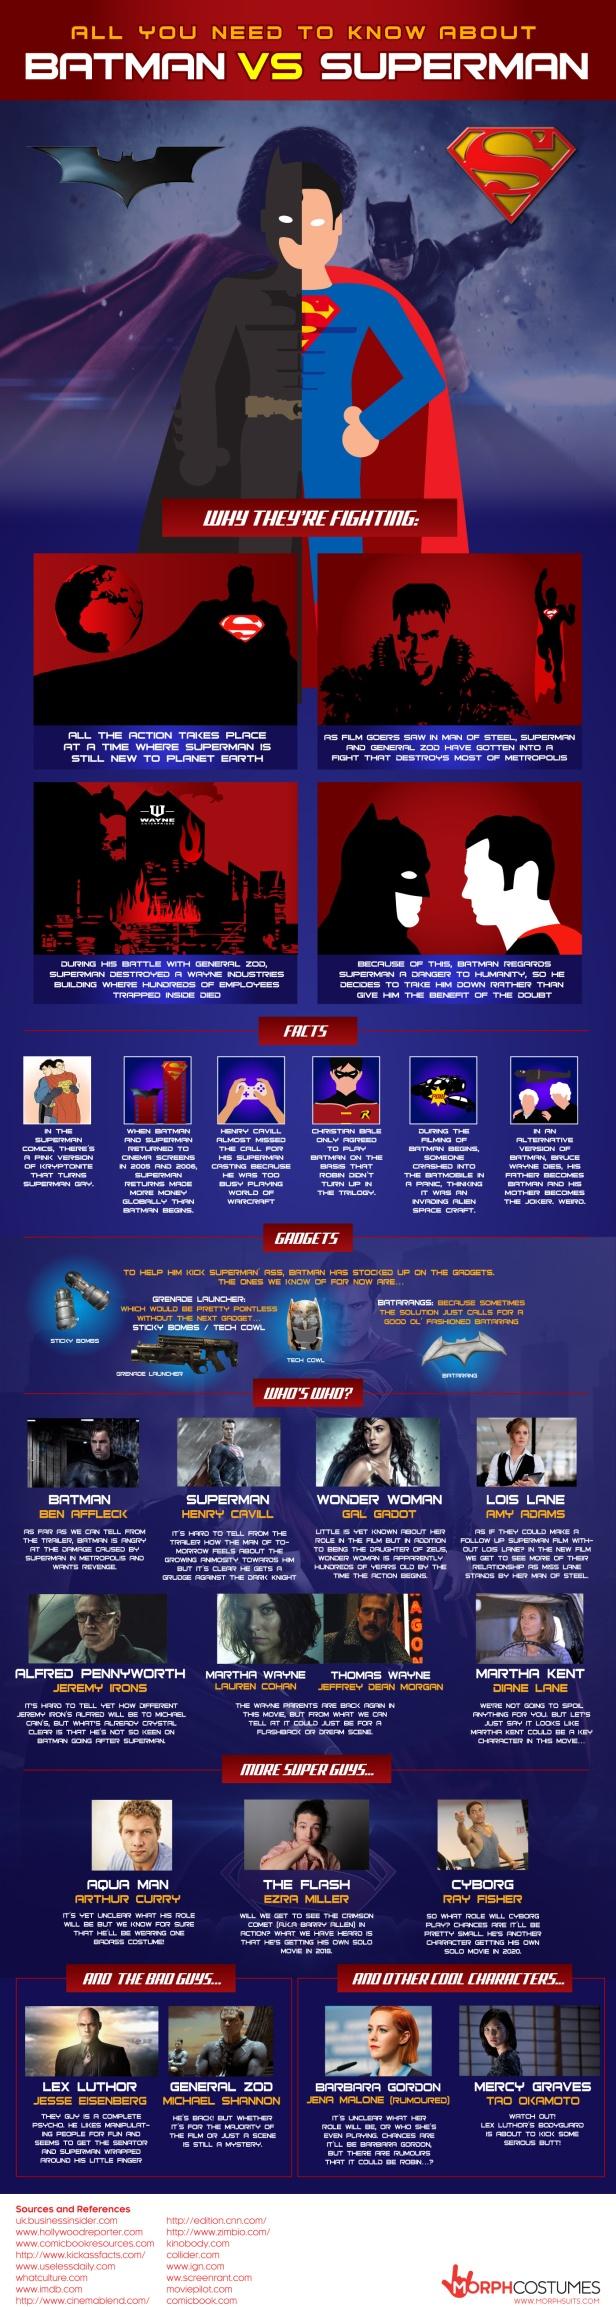 BatmanVsSuperManInfoGraphic